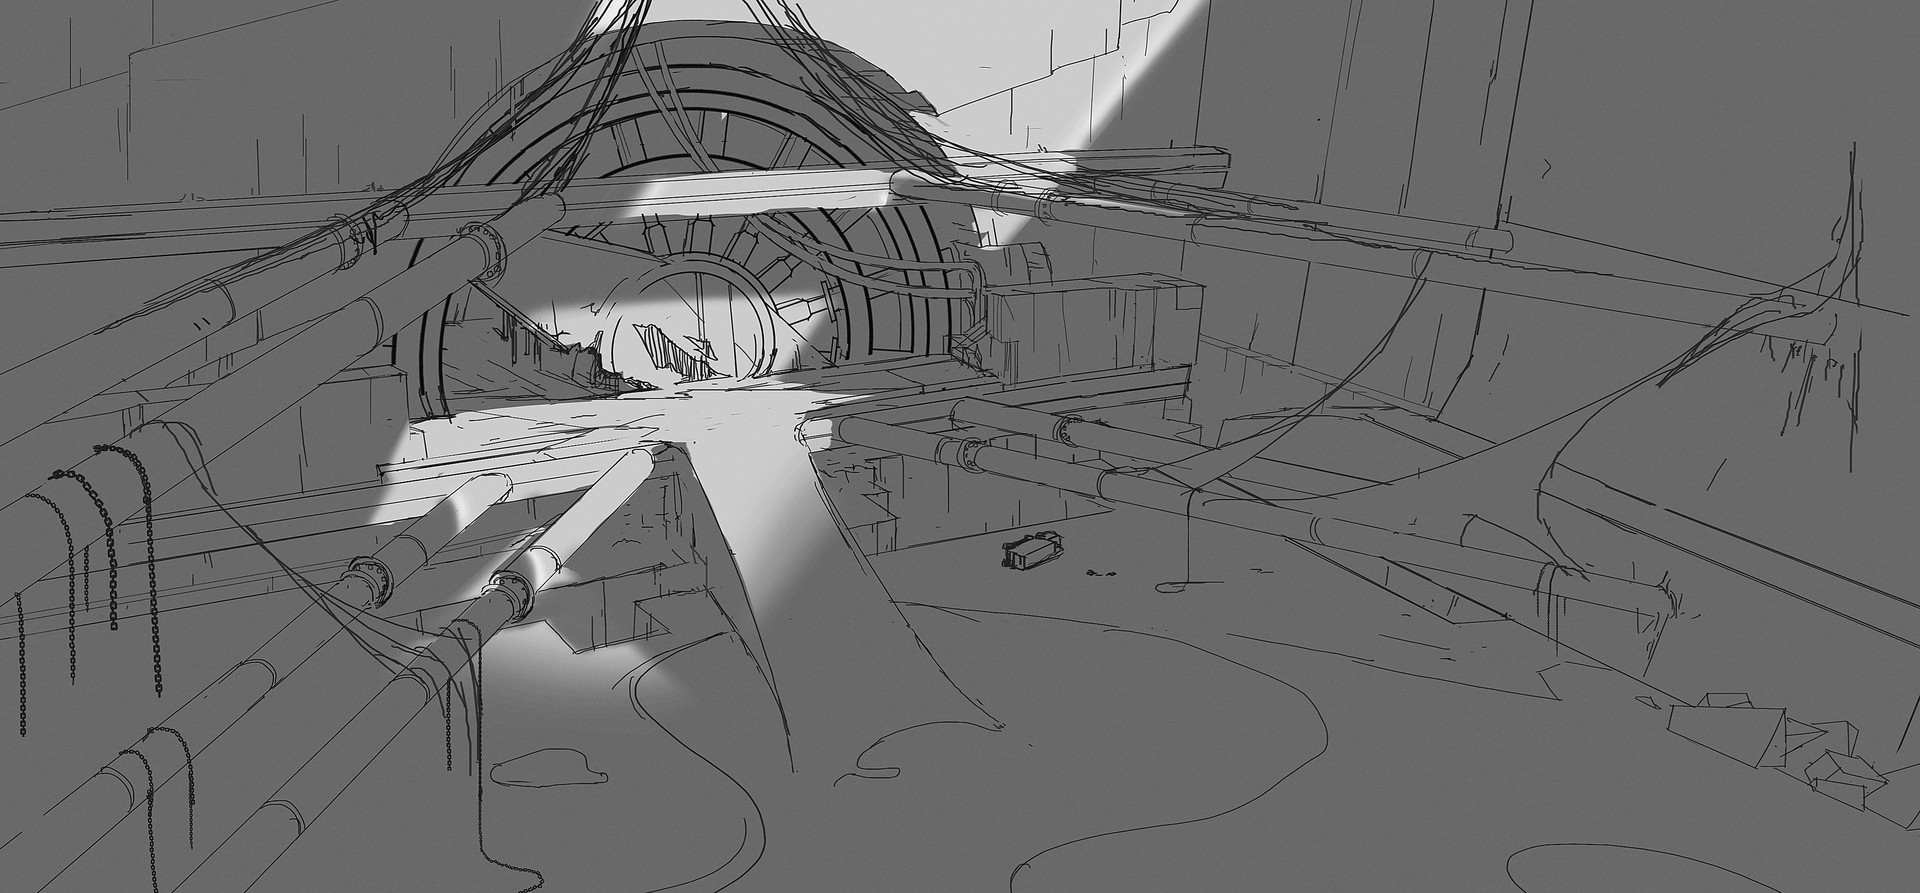 Kevin moran cave sketch